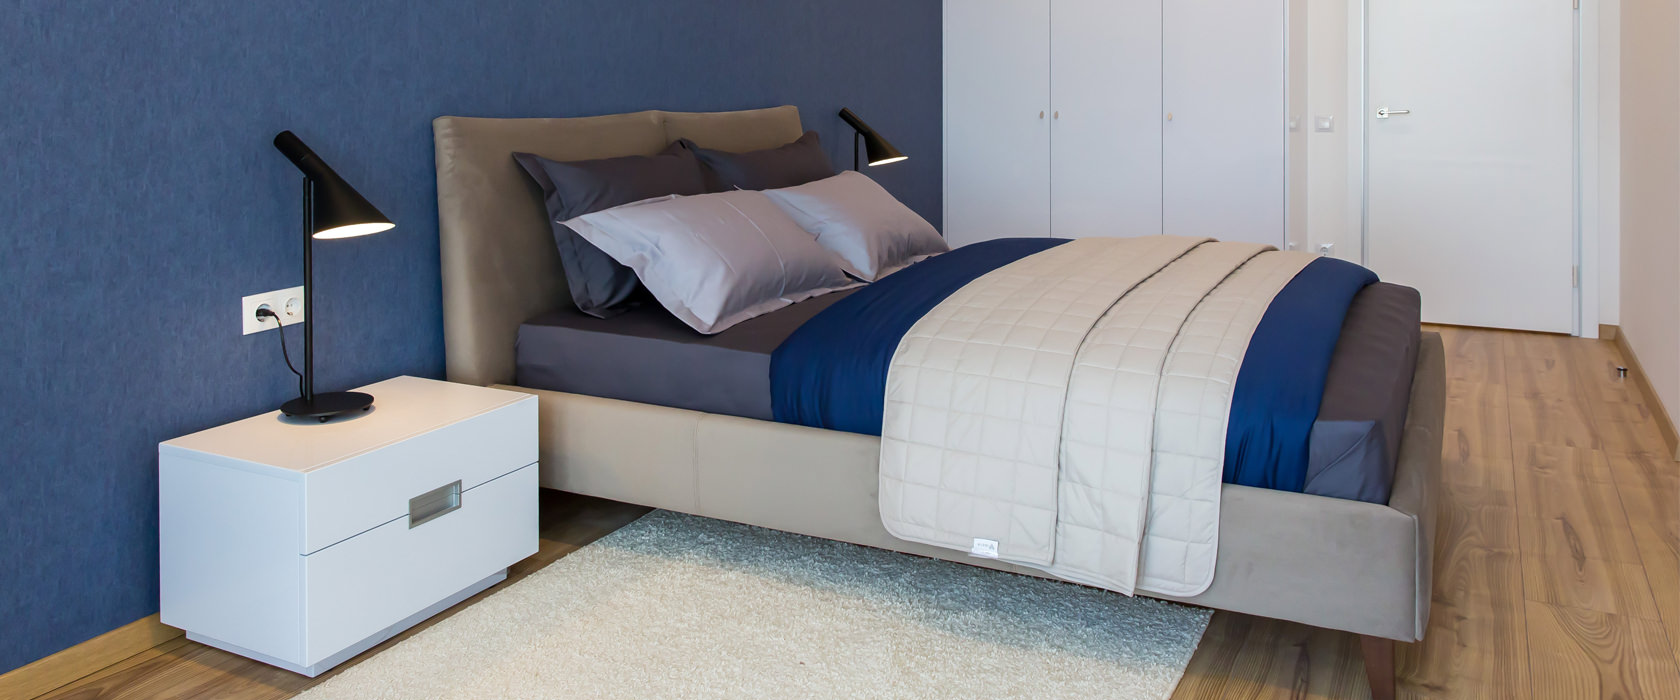 Ліжко Salerno - Фото 1 - Pufetto